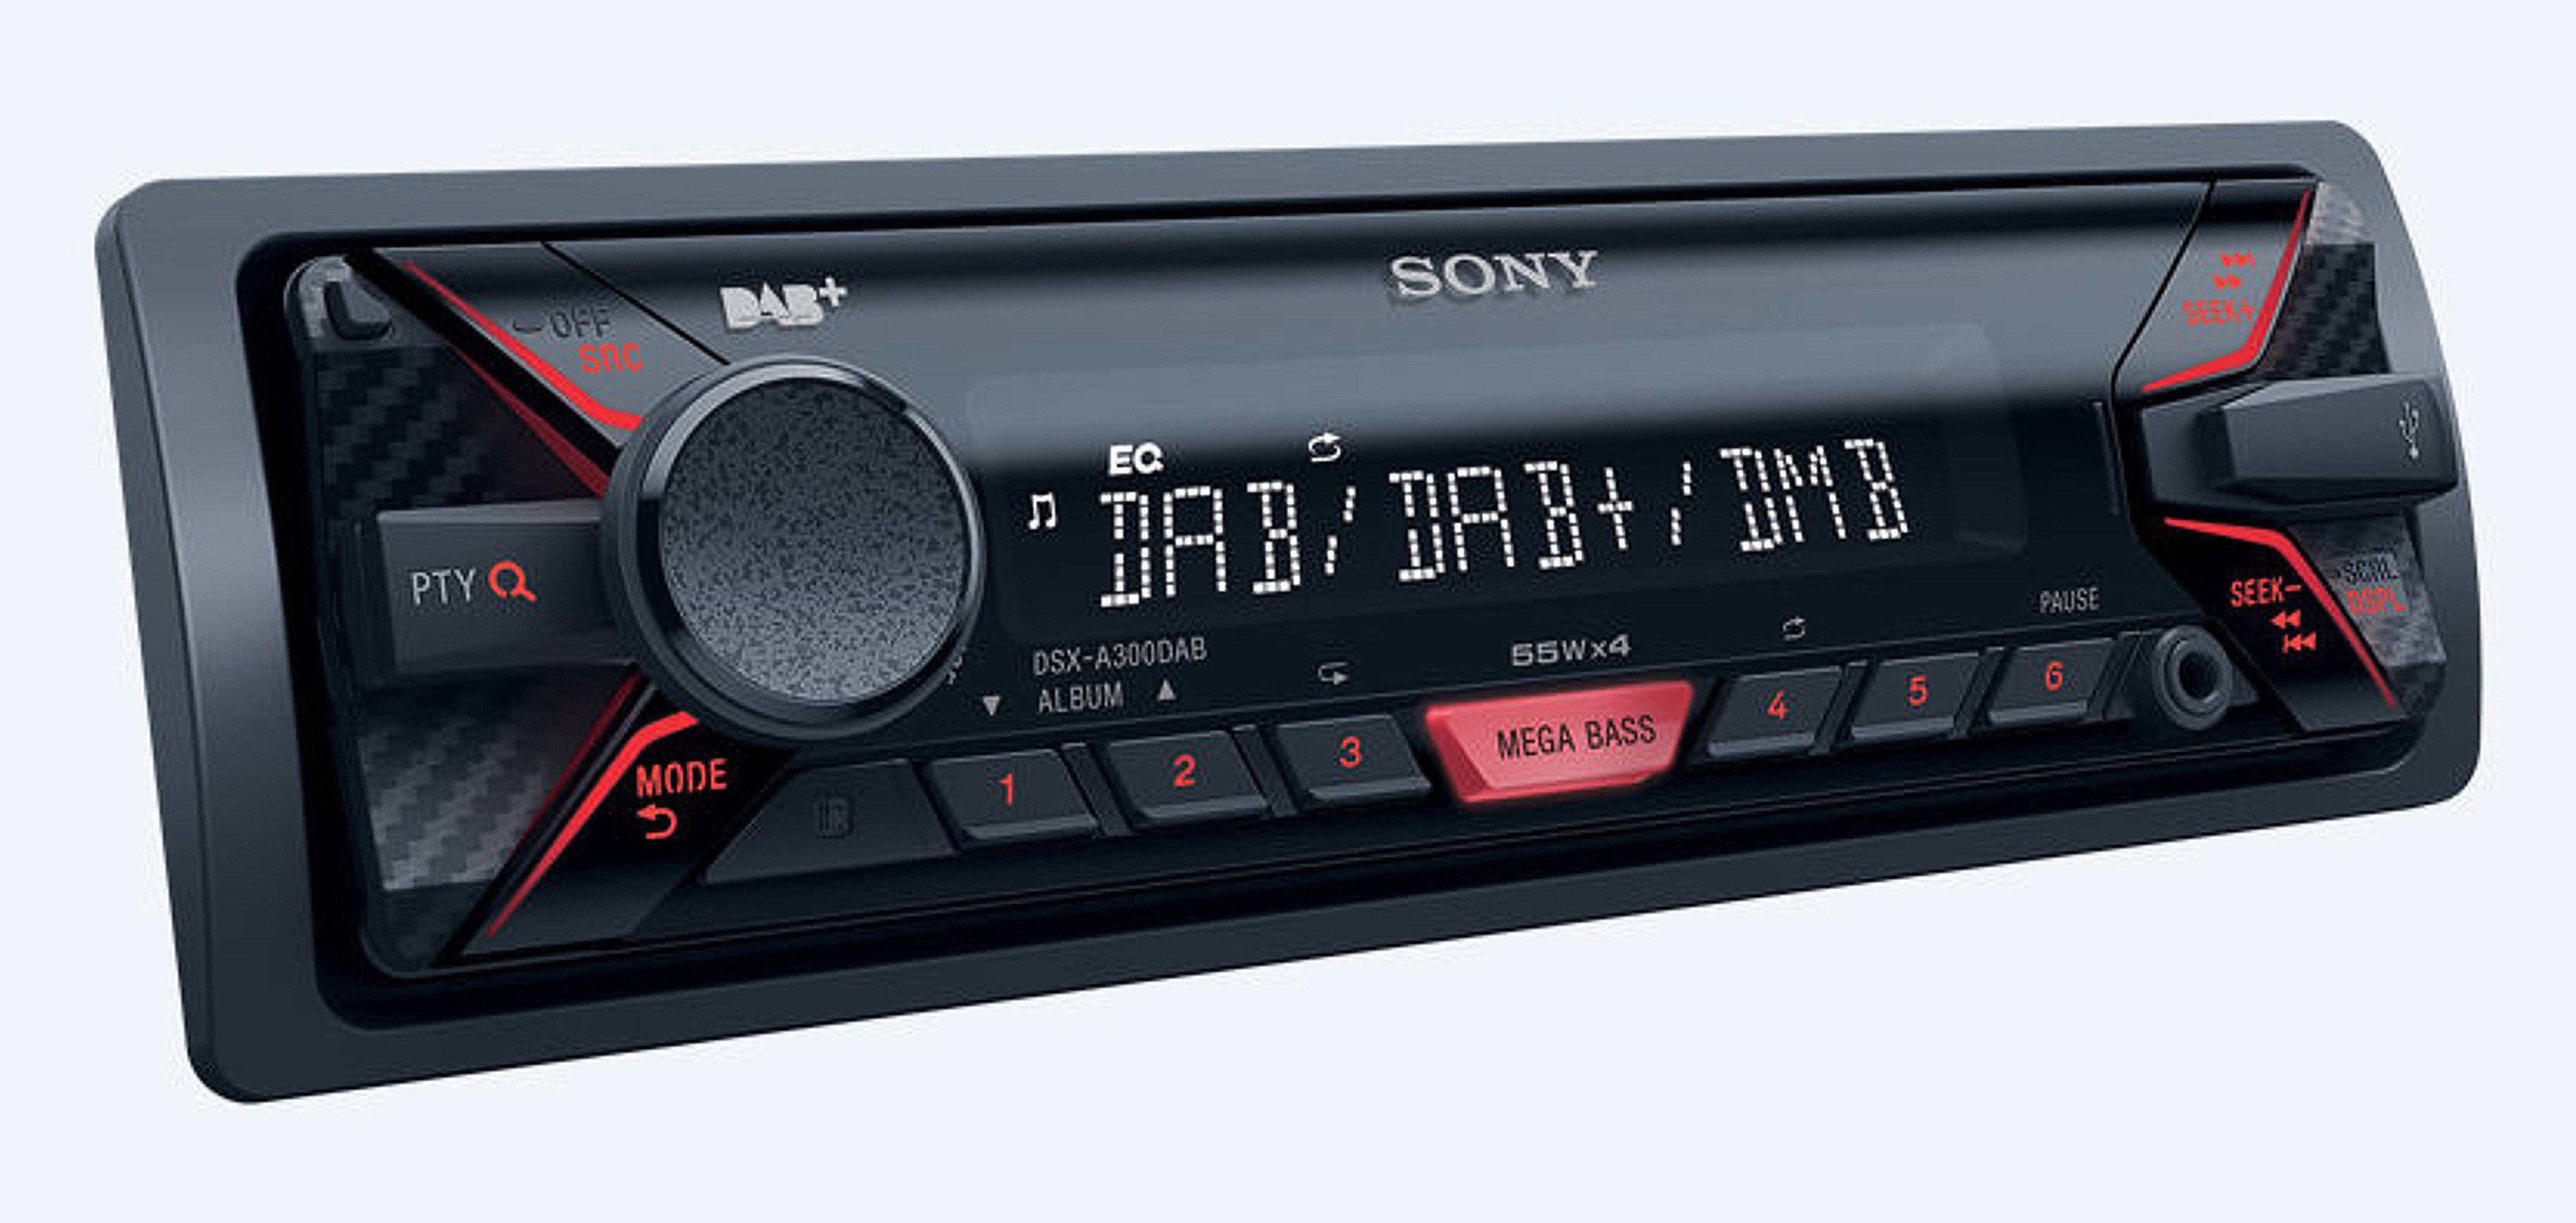 Sony 1-DIN Autoradio mit USB & Bluetooth® »DSX-A300DKITEI«